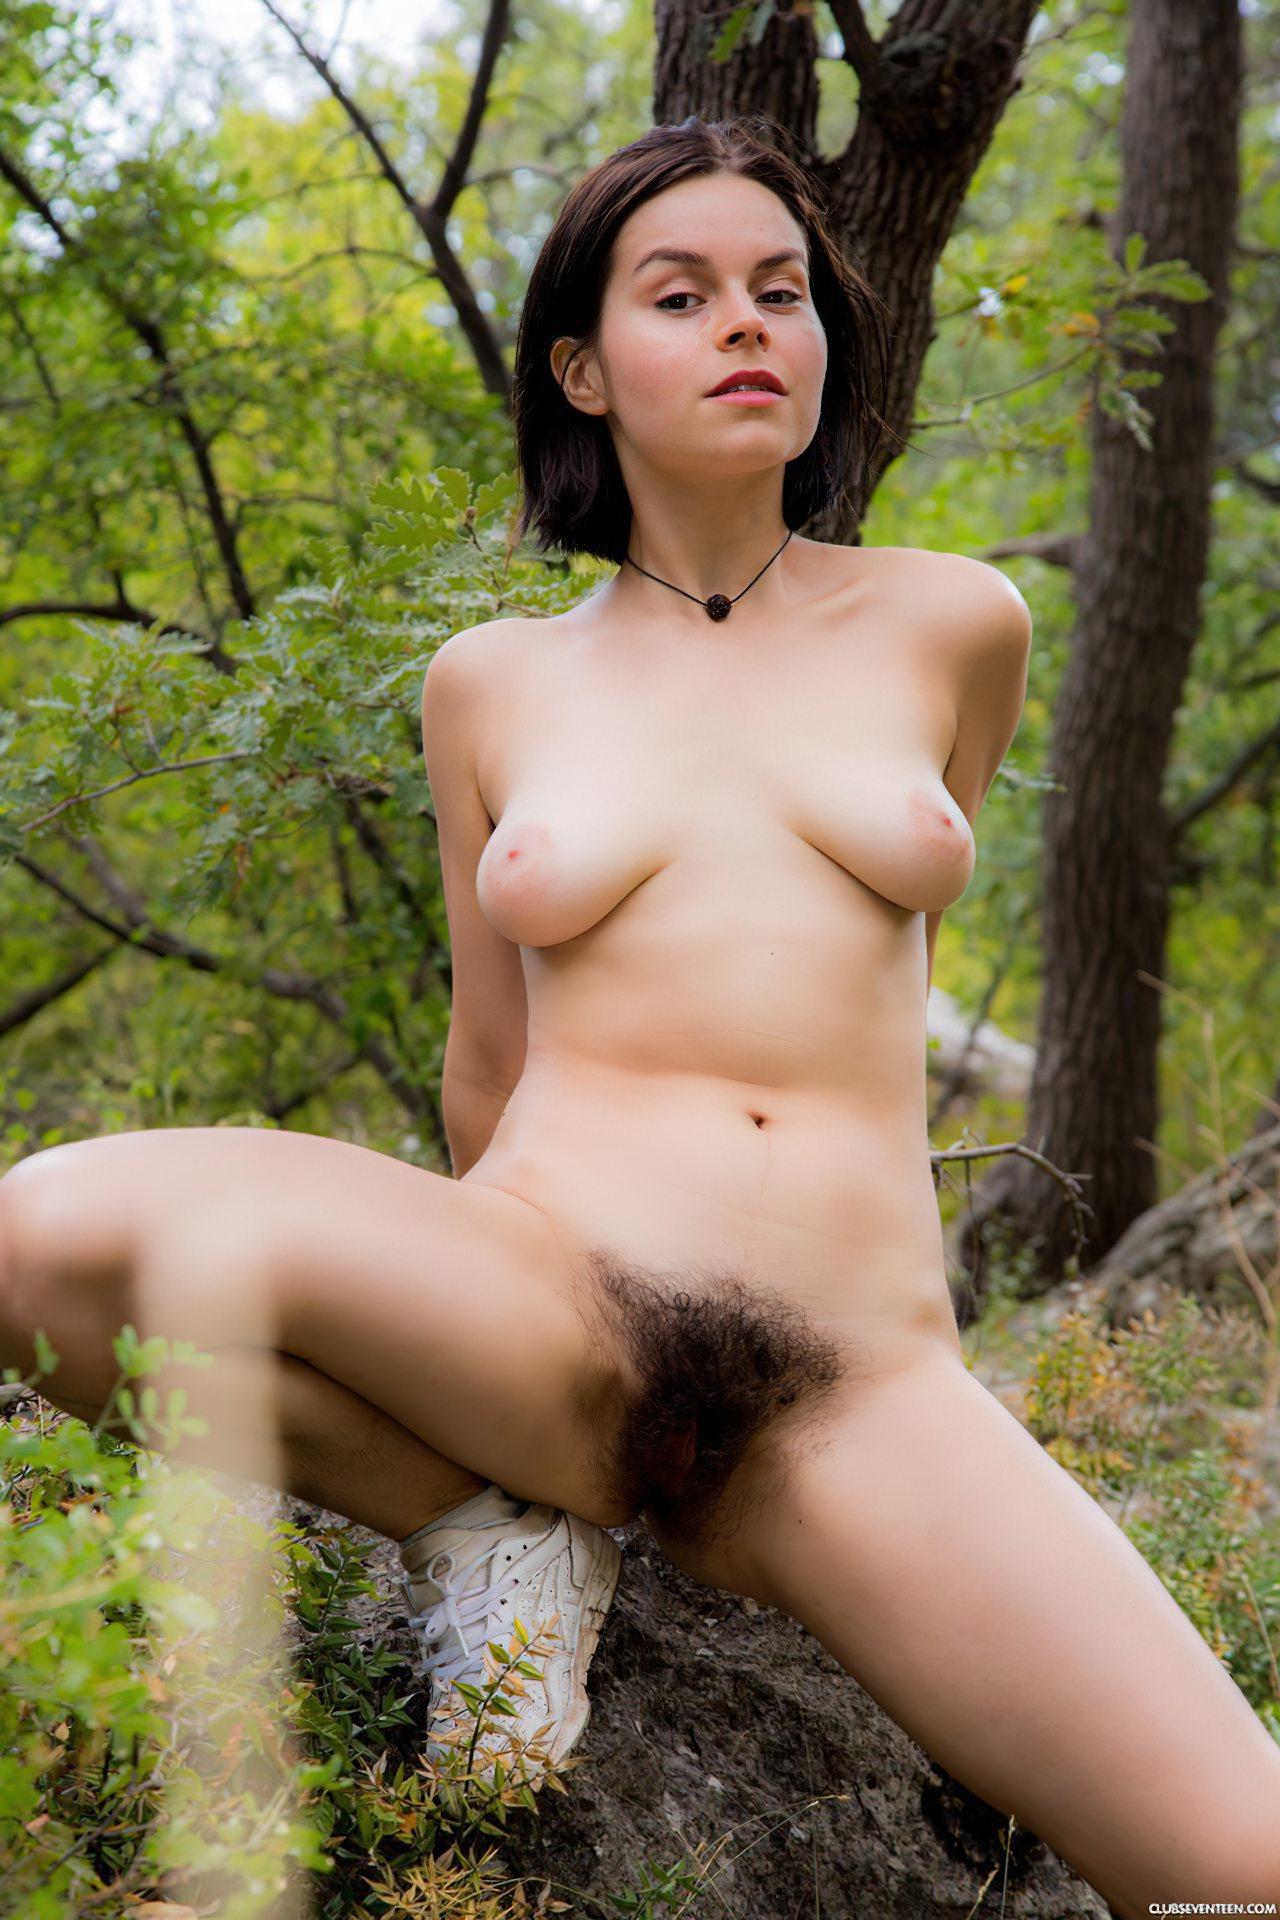 Mulheres Despidas Fotos (25)